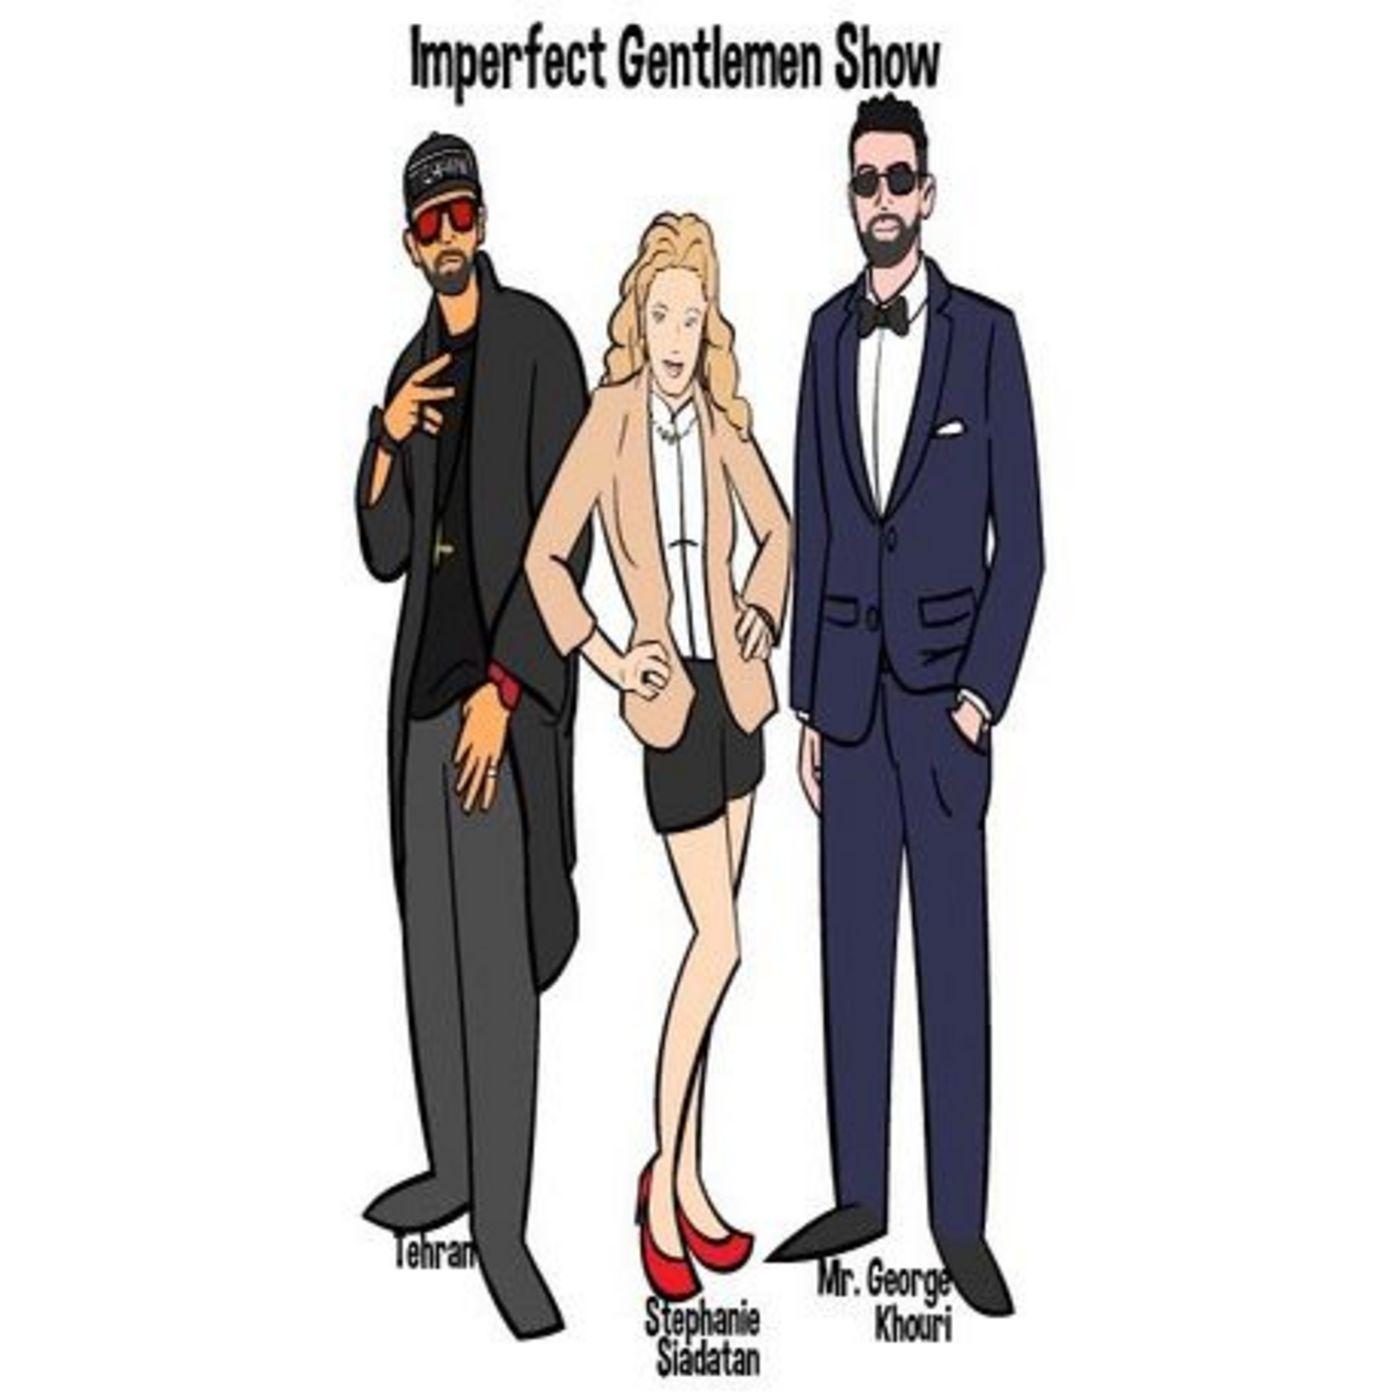 <![CDATA[Imperfect Gentlemen Show]]>